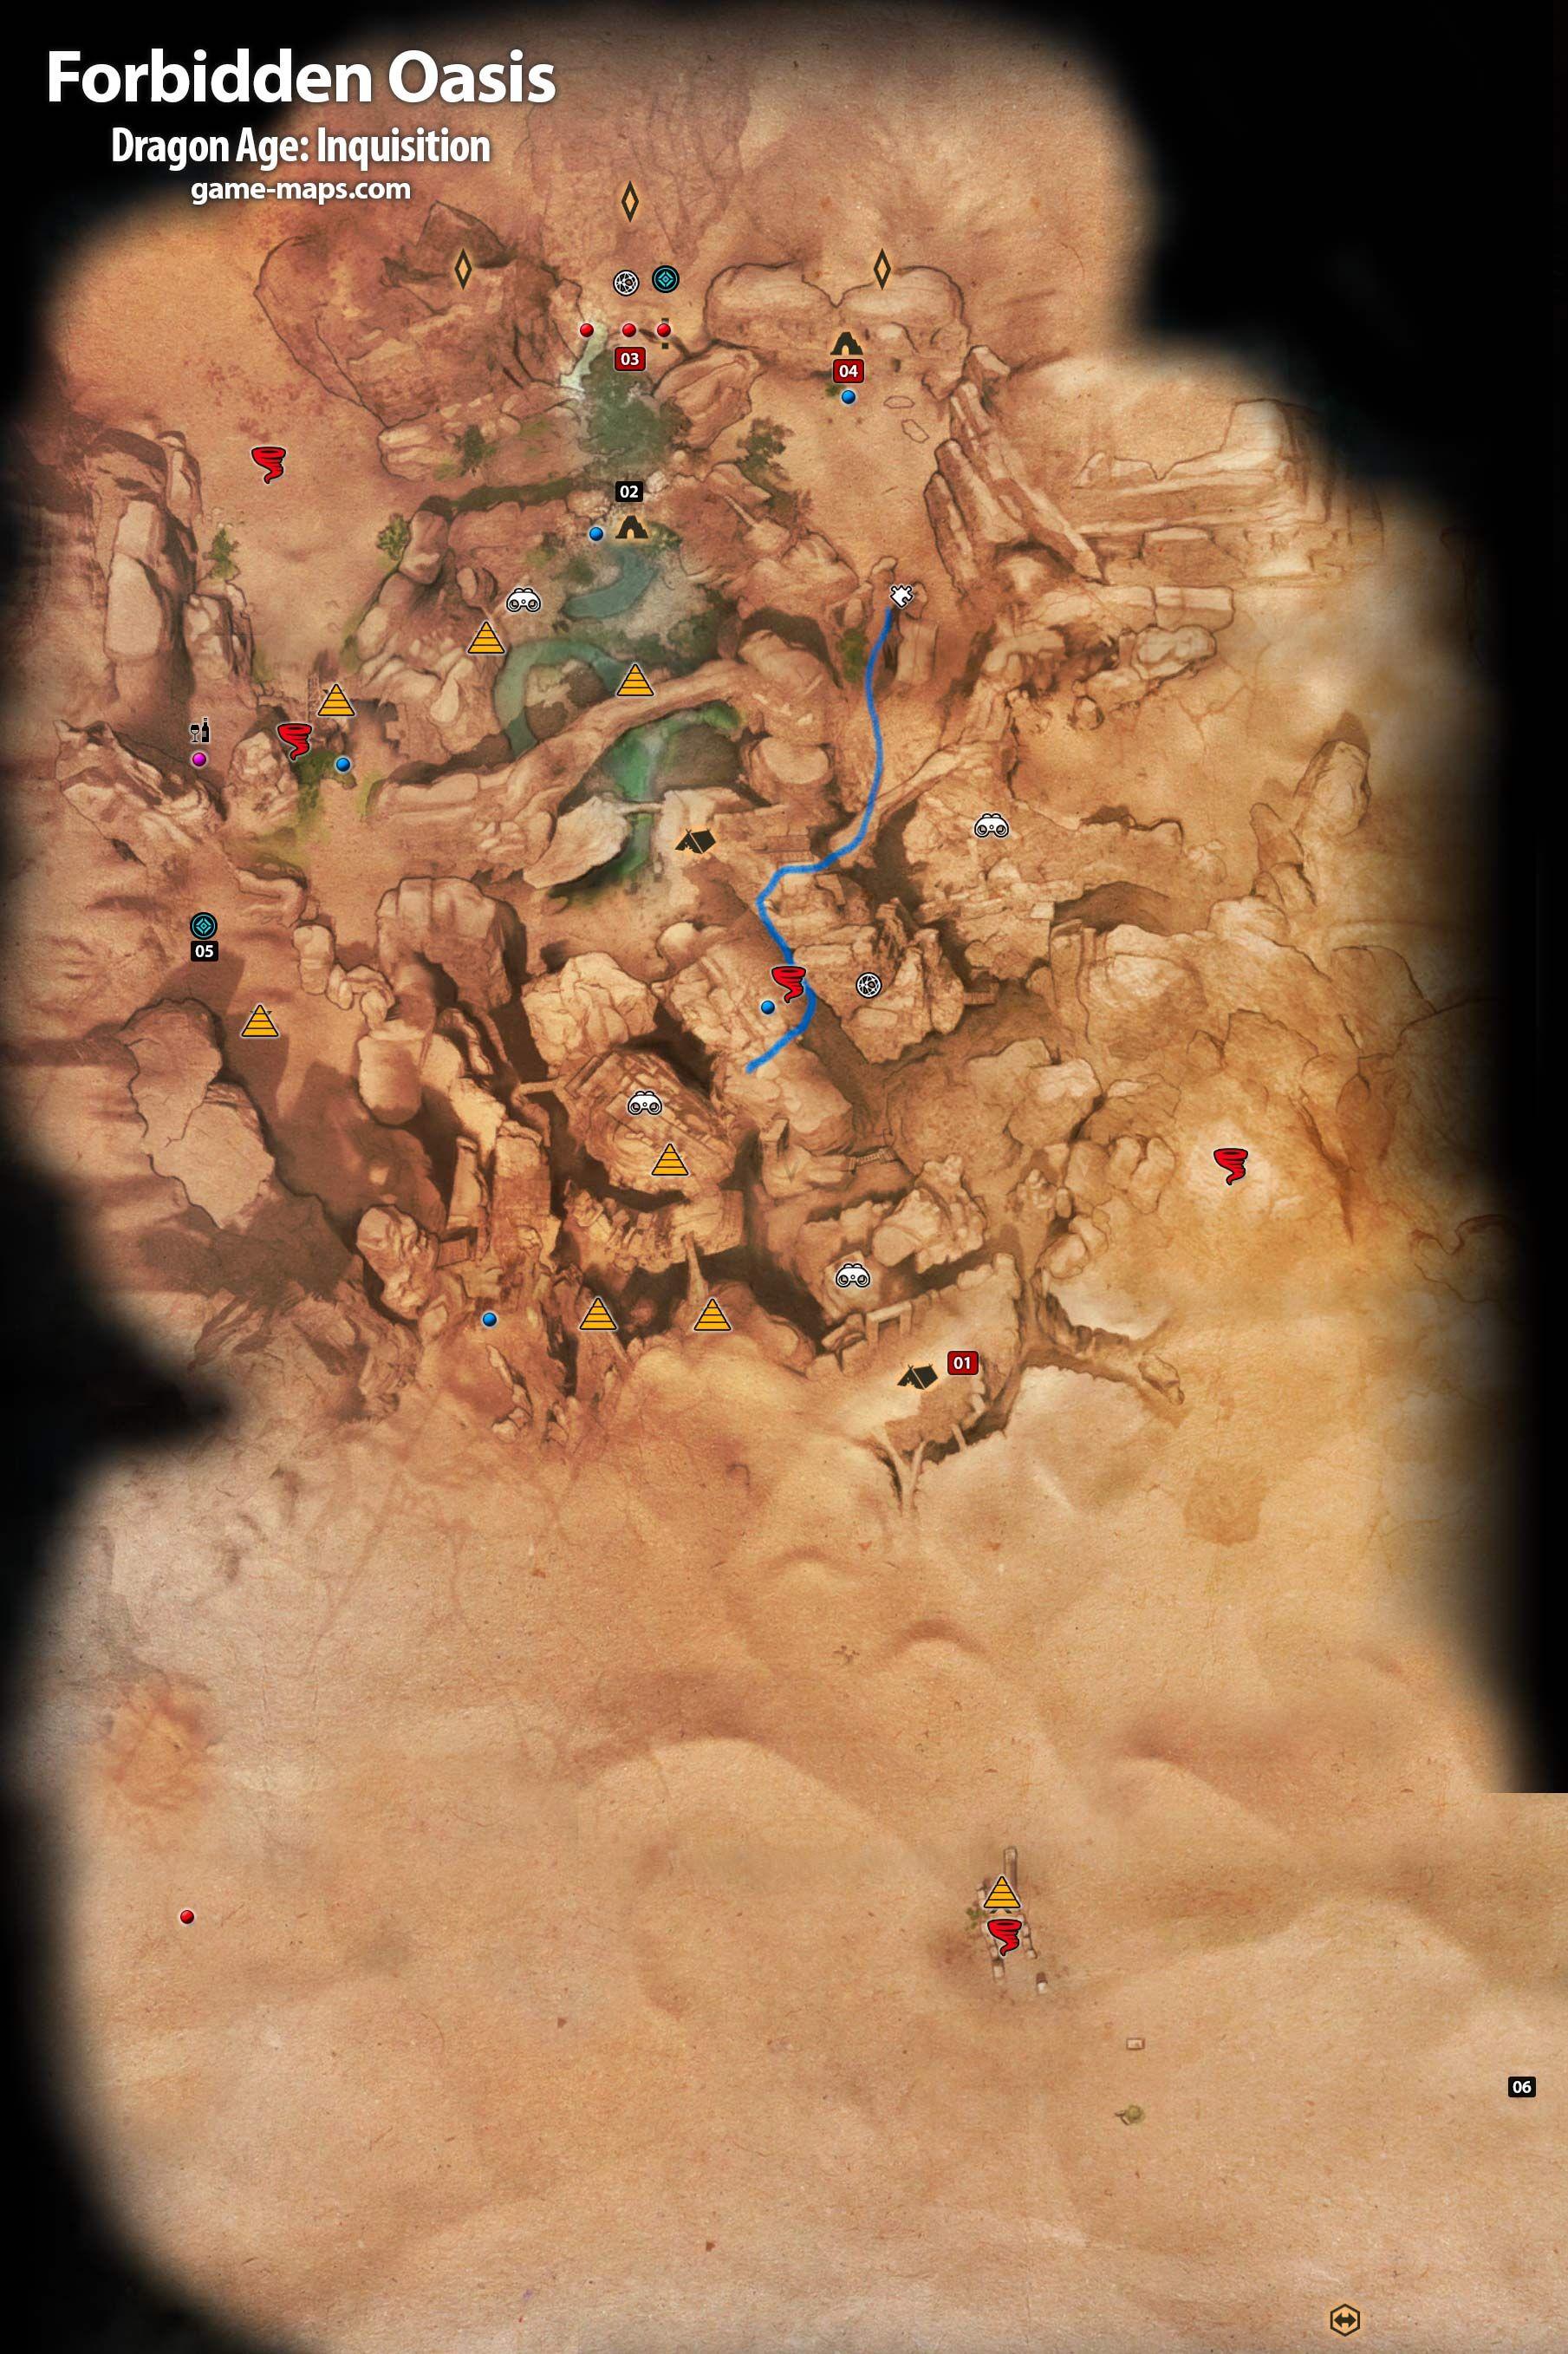 httpgame mapscomDAIimgForbidden httpgame mapscomDAIimgForbidden Oasisjpg Canyons Rocks and